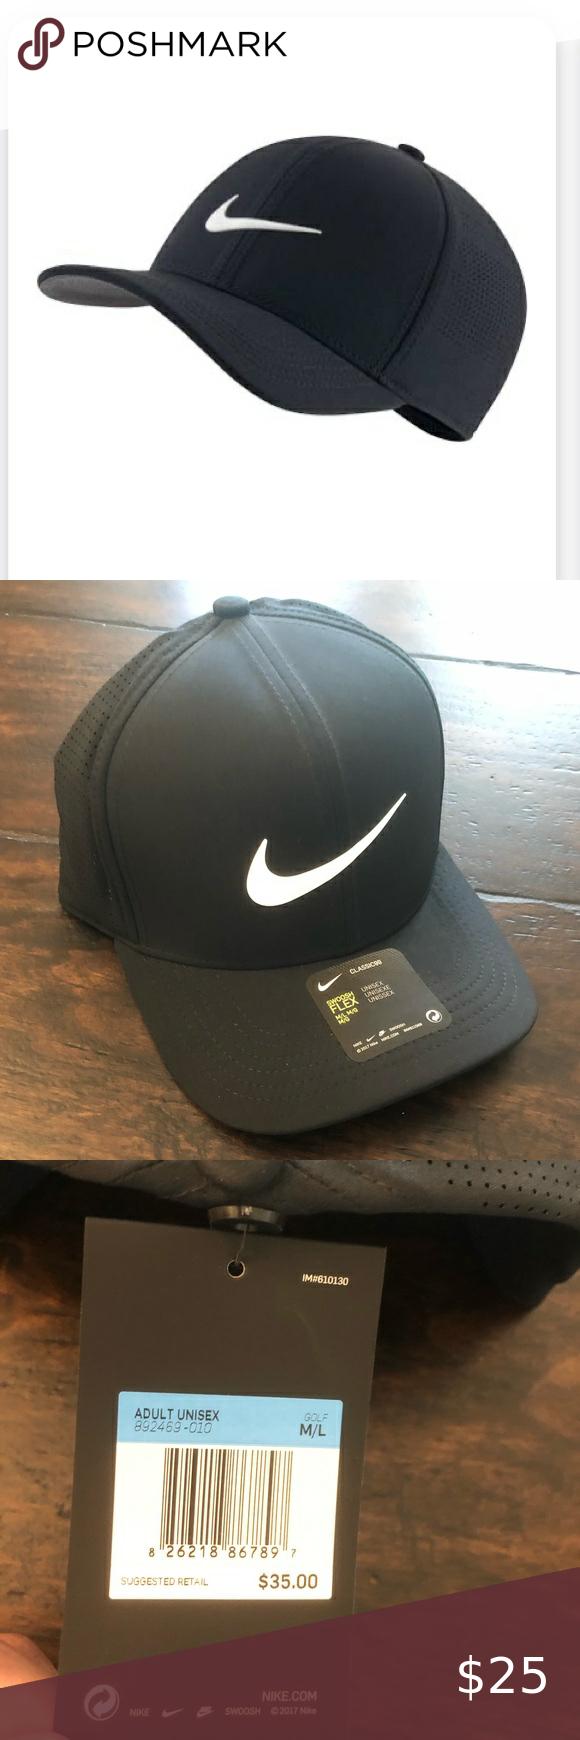 Nike Aerobill Classic Hat Classic Hats Nike Accessories Nike